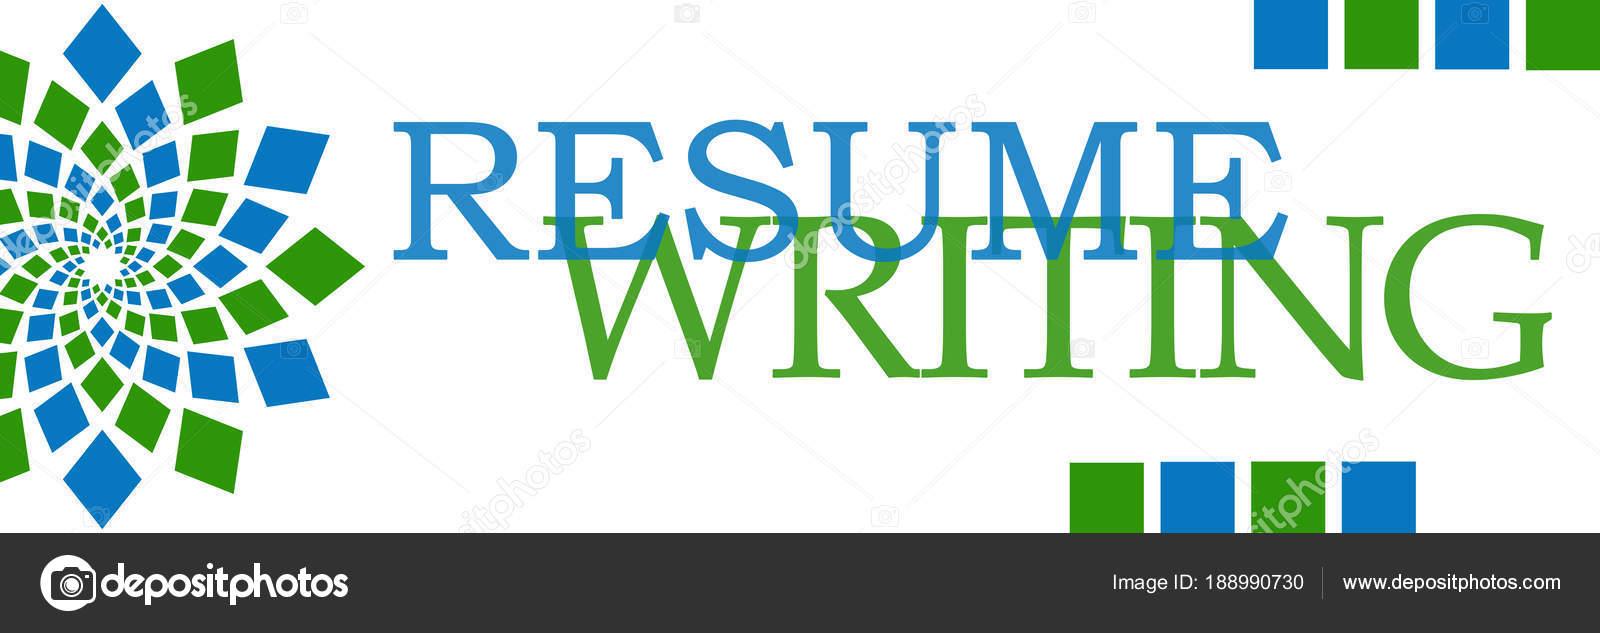 Reanudar Escritura Texto Escrito Sobre Fondo Azul Verde — Fotos de ...